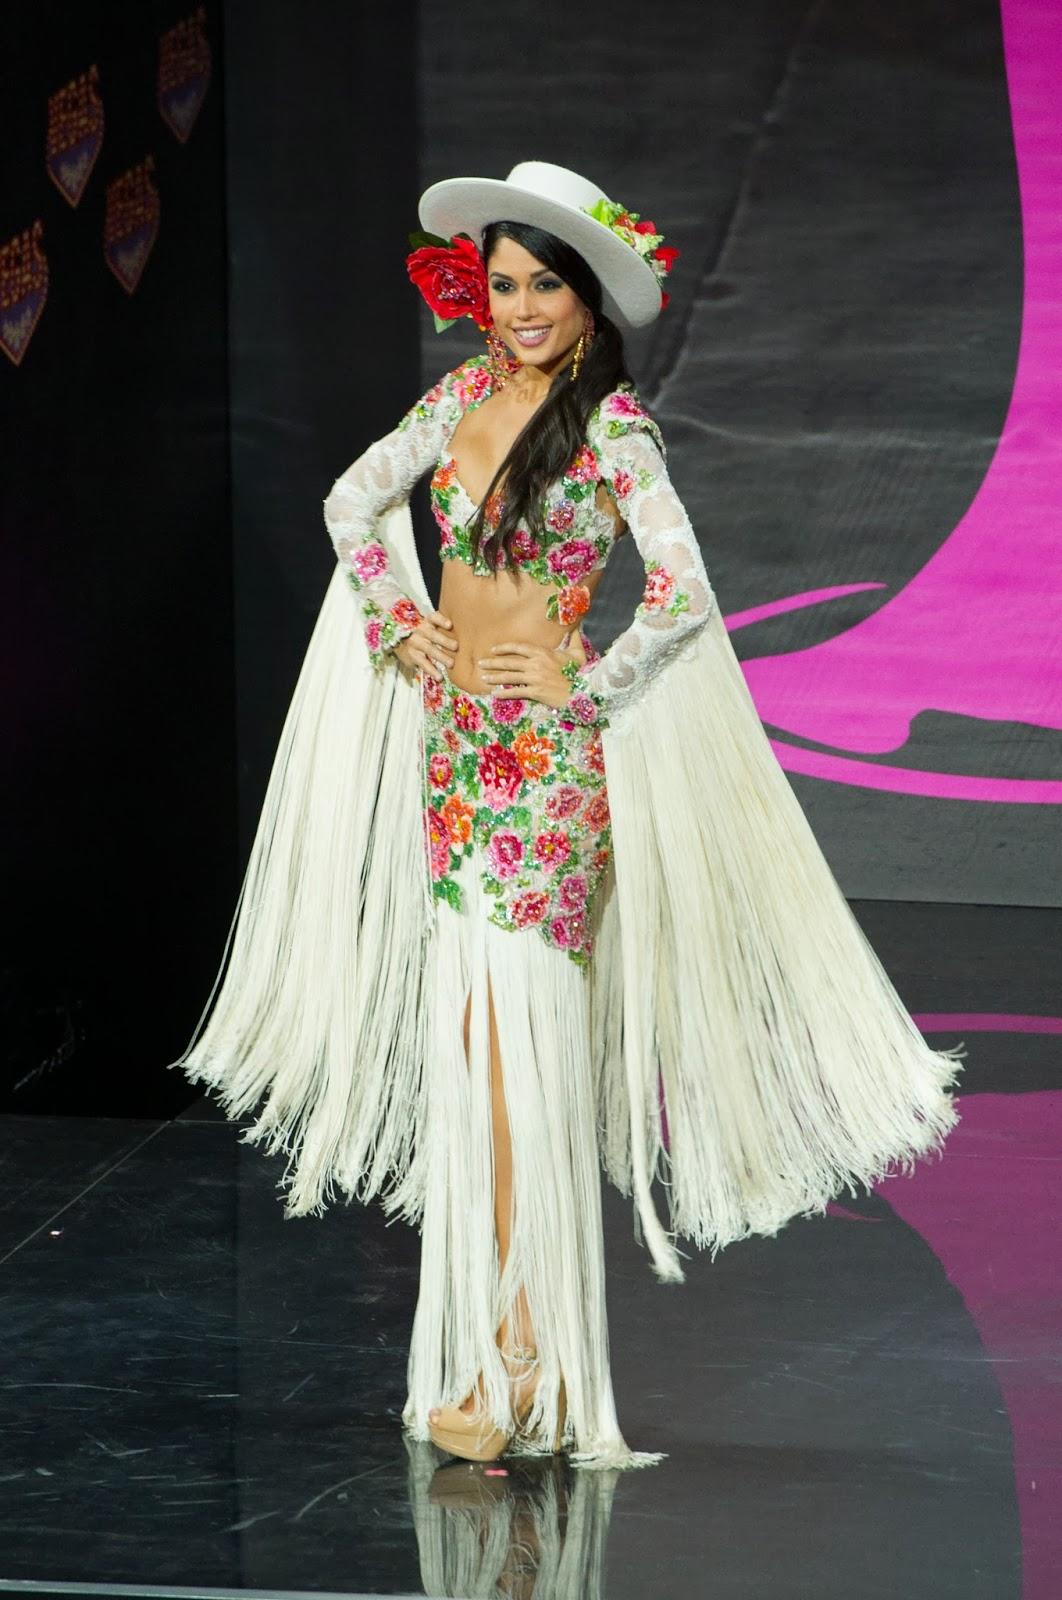 patricia yurena rodriguez, miss espana 2008/2013, 1st runner-up de miss universe 2013. - Página 3 Uni20110